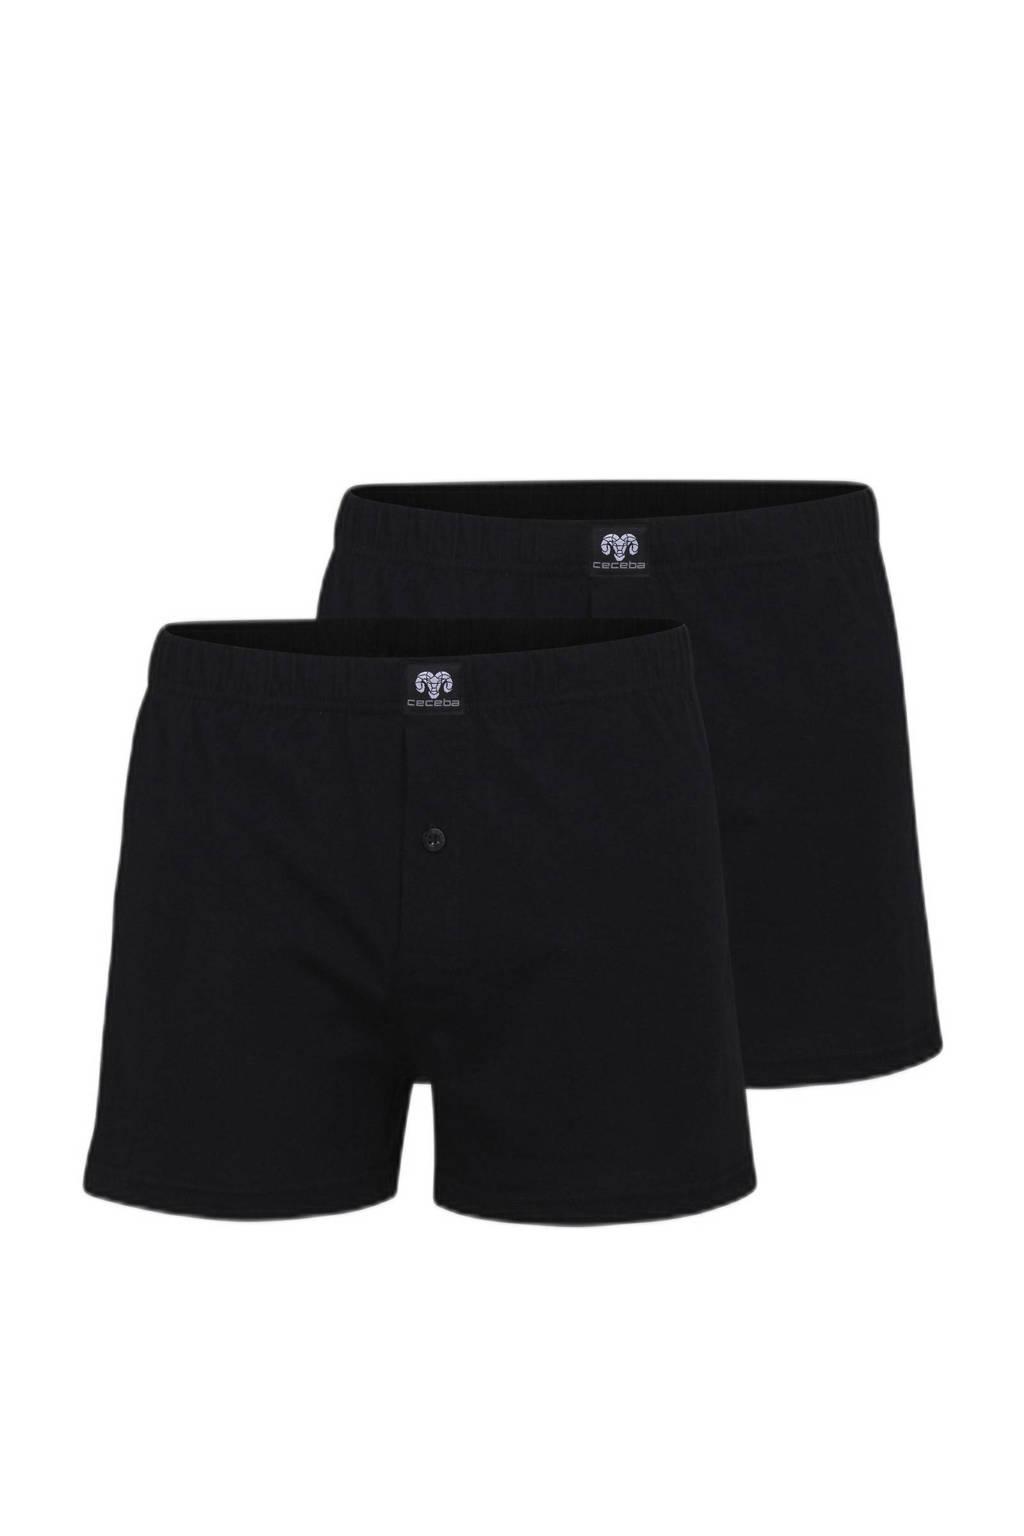 Ceceba +size boxershort (set van 2), Zwart